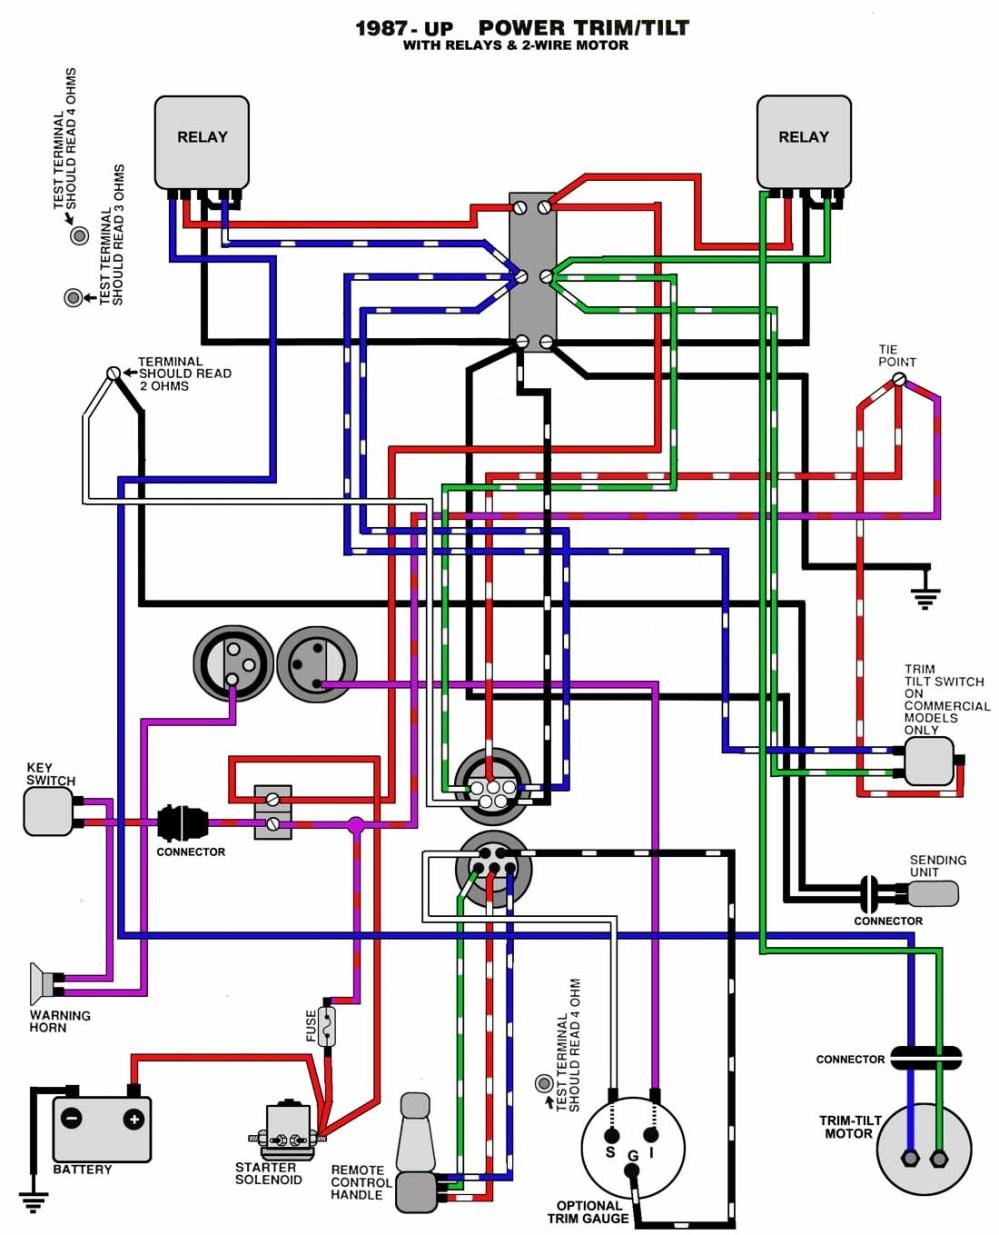 medium resolution of 3 cylinder 90 hp mercury wiring diagram wiring library rh 78 skriptoase de 50 hp mercury outboard wiring diagram 1971 mercury outboard wiring diagram